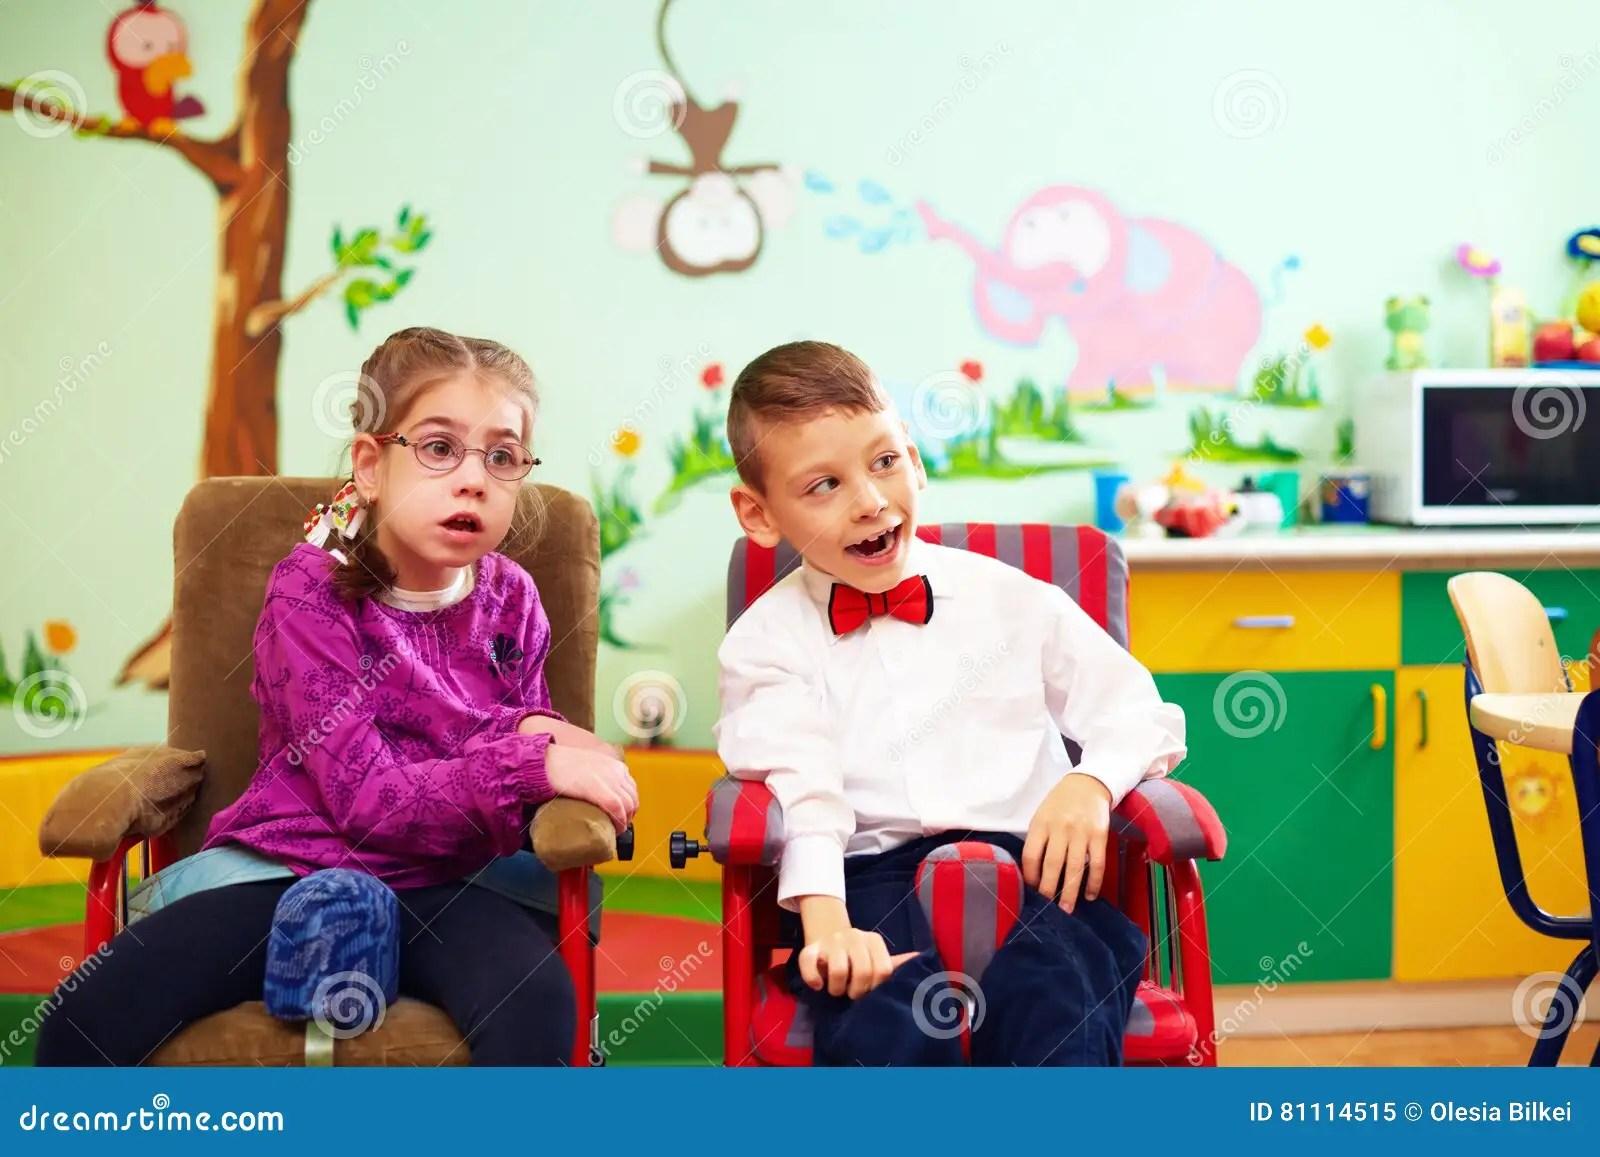 Cute Kids In Wheelchairs At Kindergarten For Children With